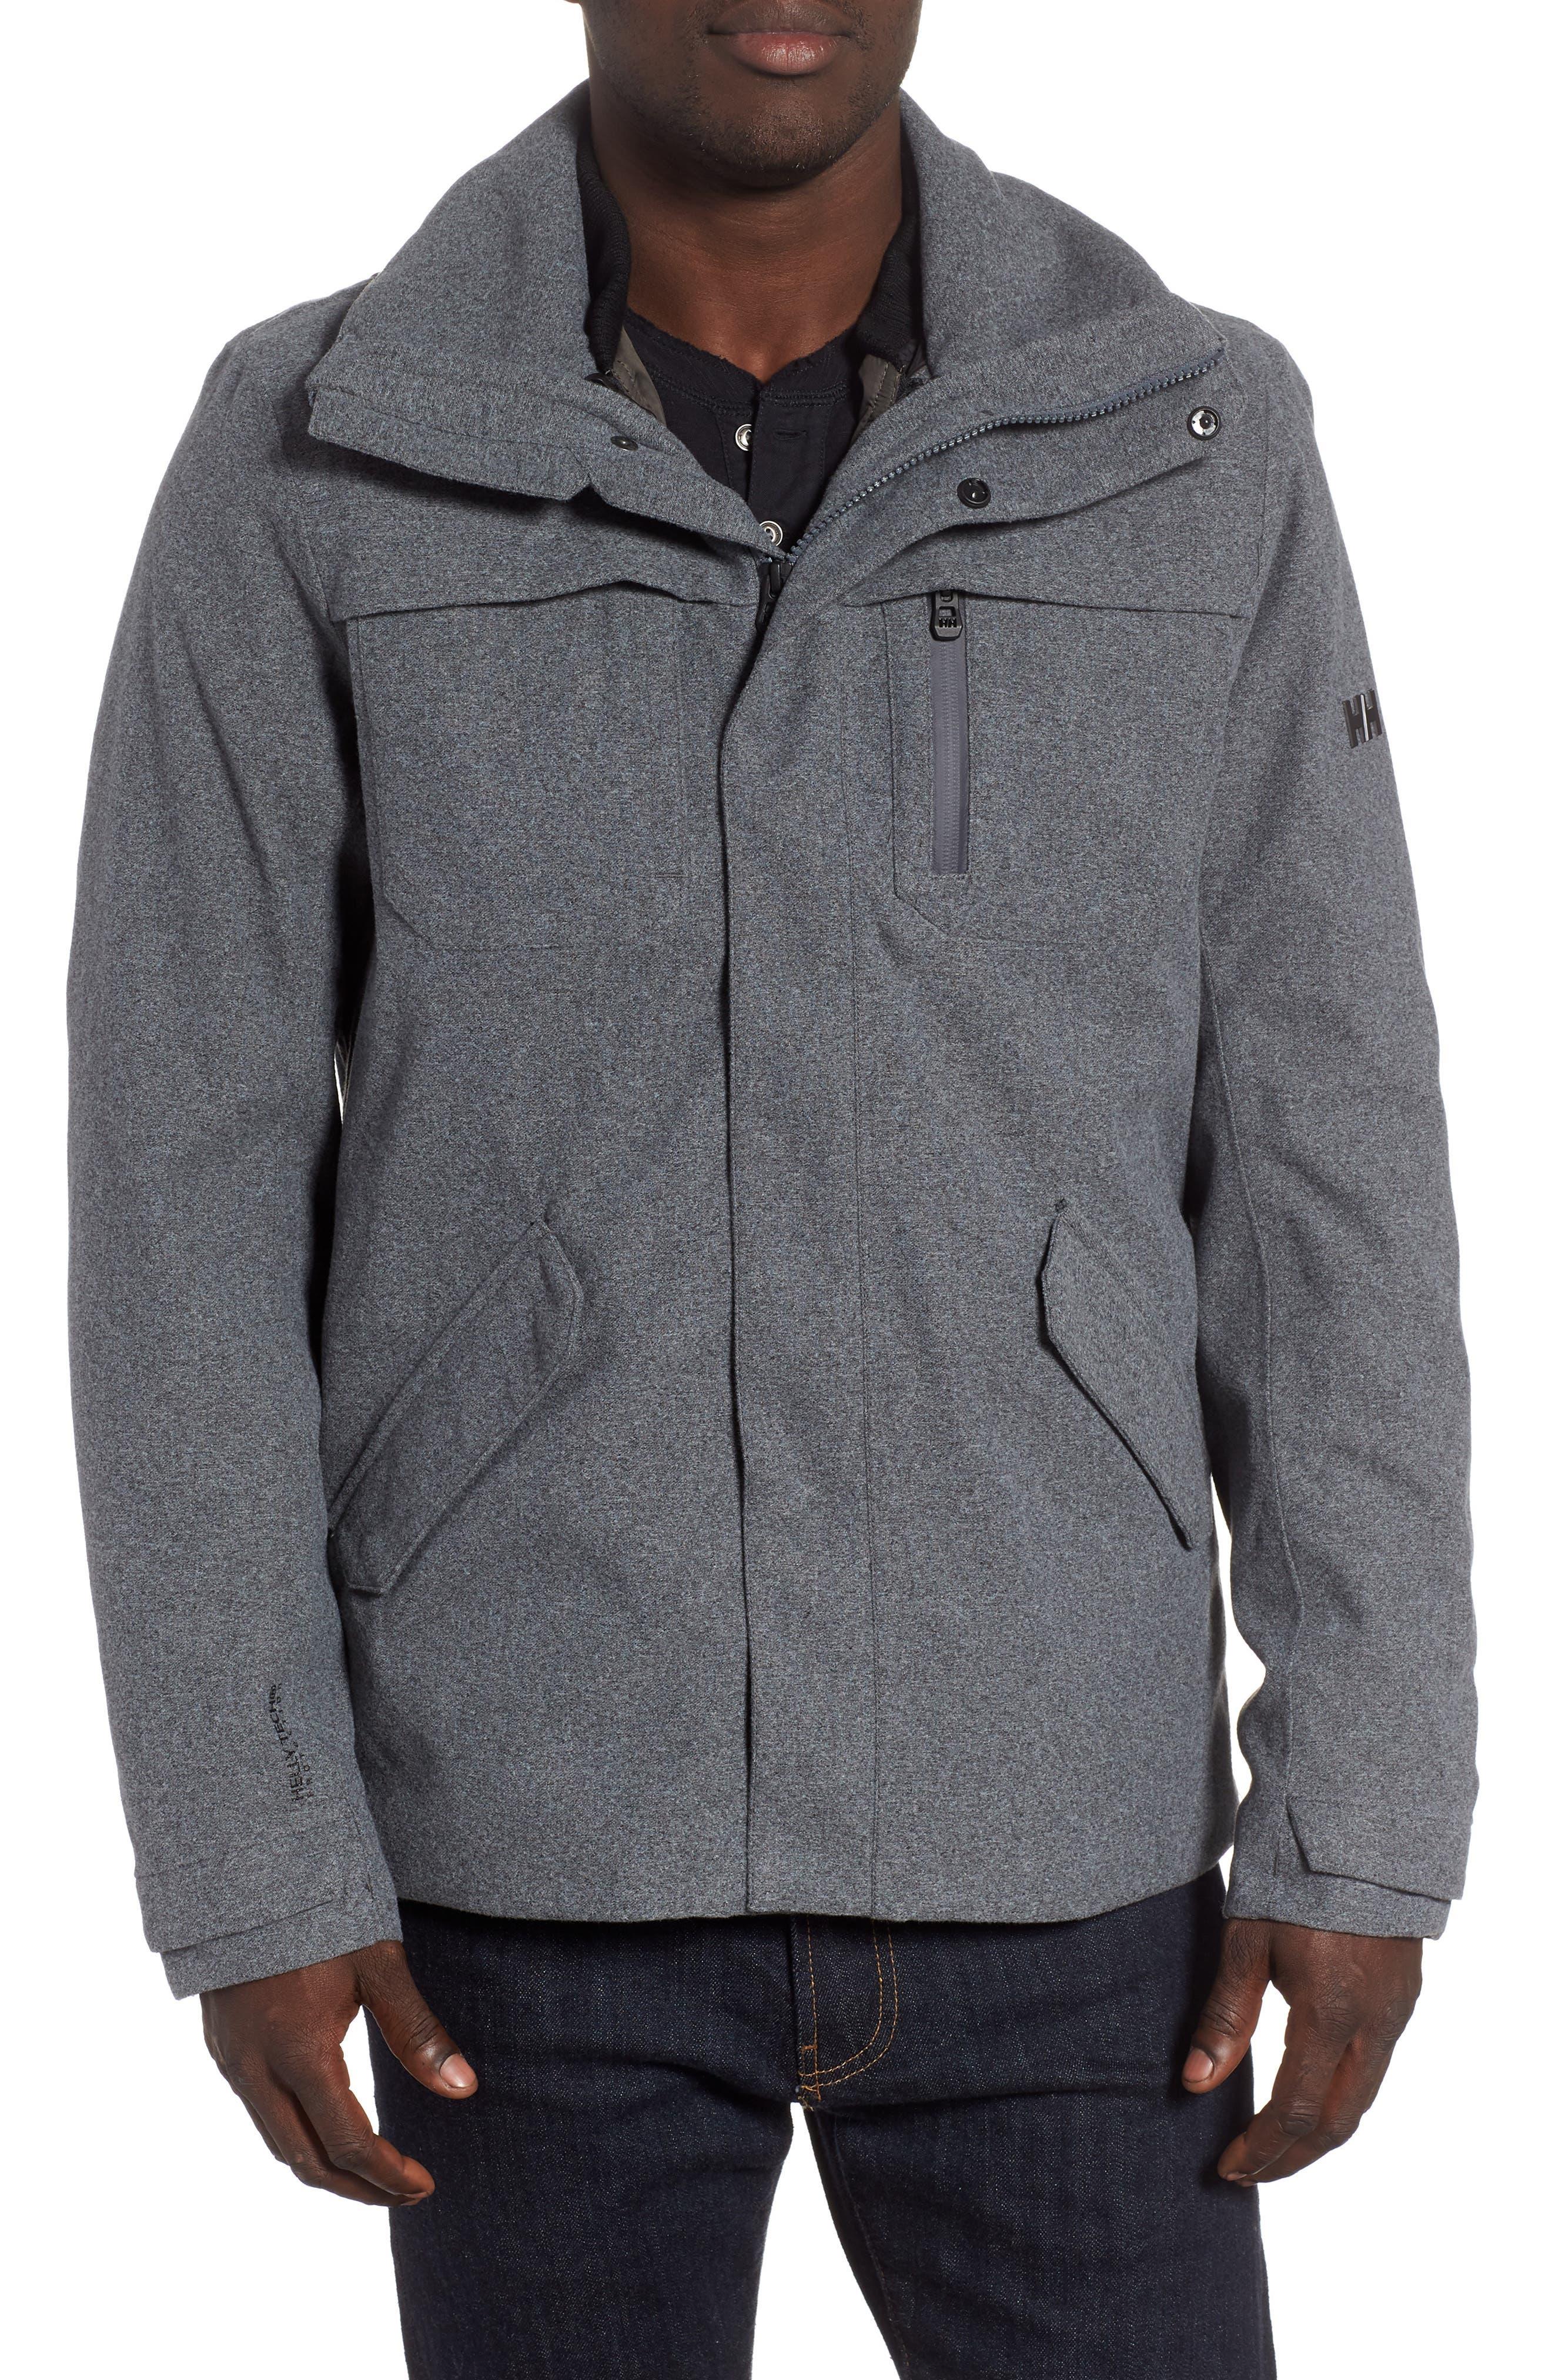 Helly Hansen Reykjavik Regular Fit Waterproof Primaloft 3-In-1 Jacket, Grey